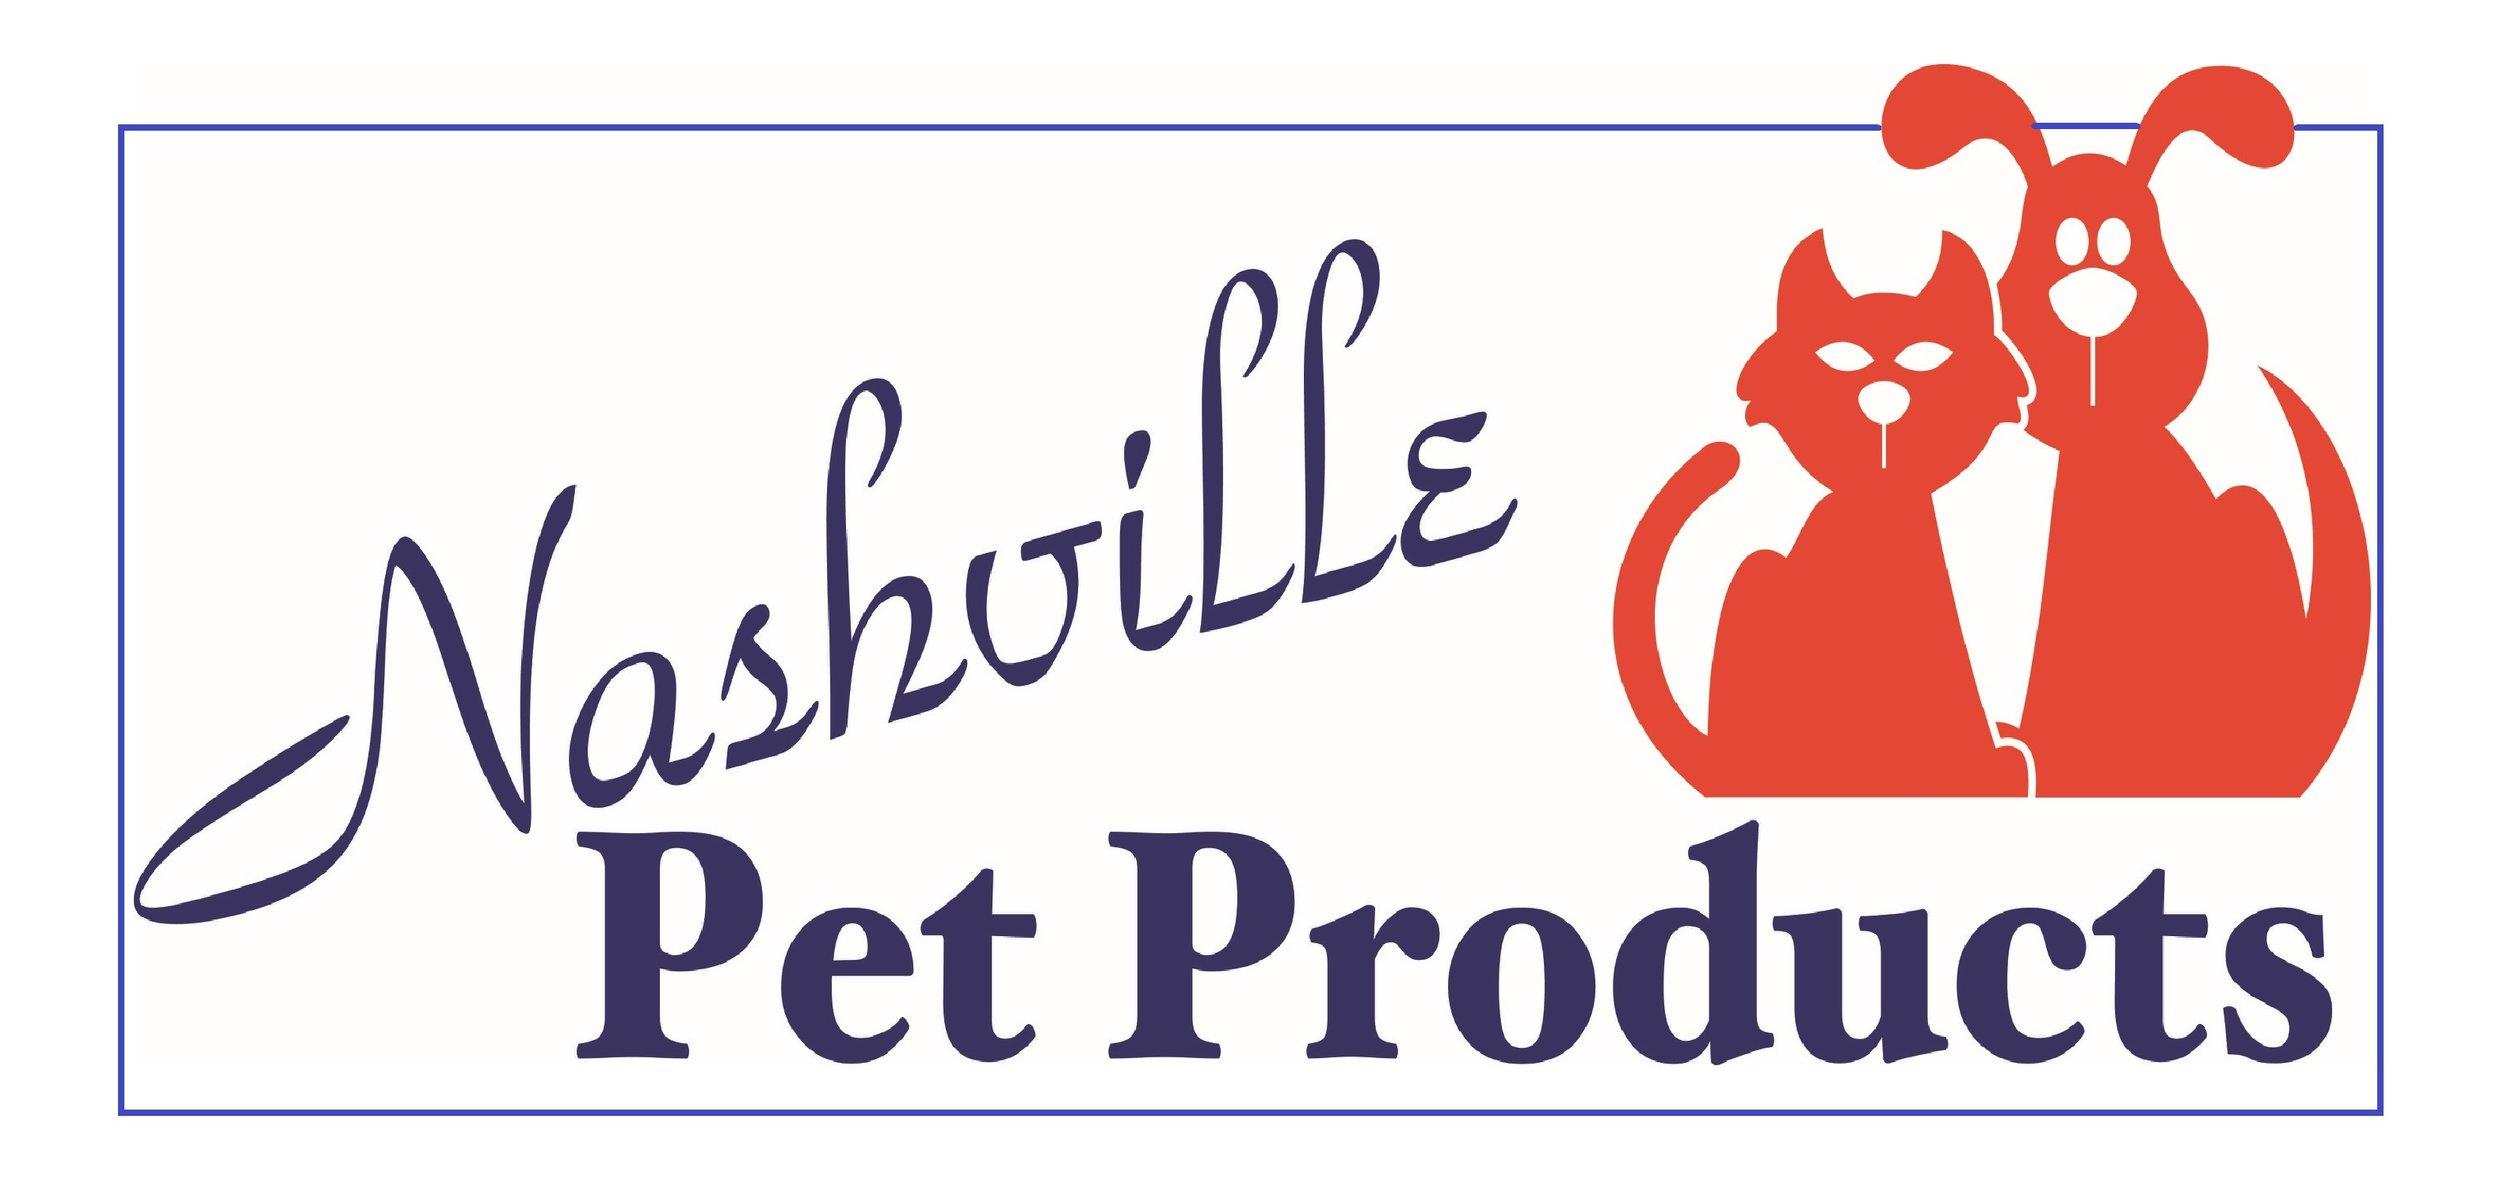 Nashville Pet Products.jpg